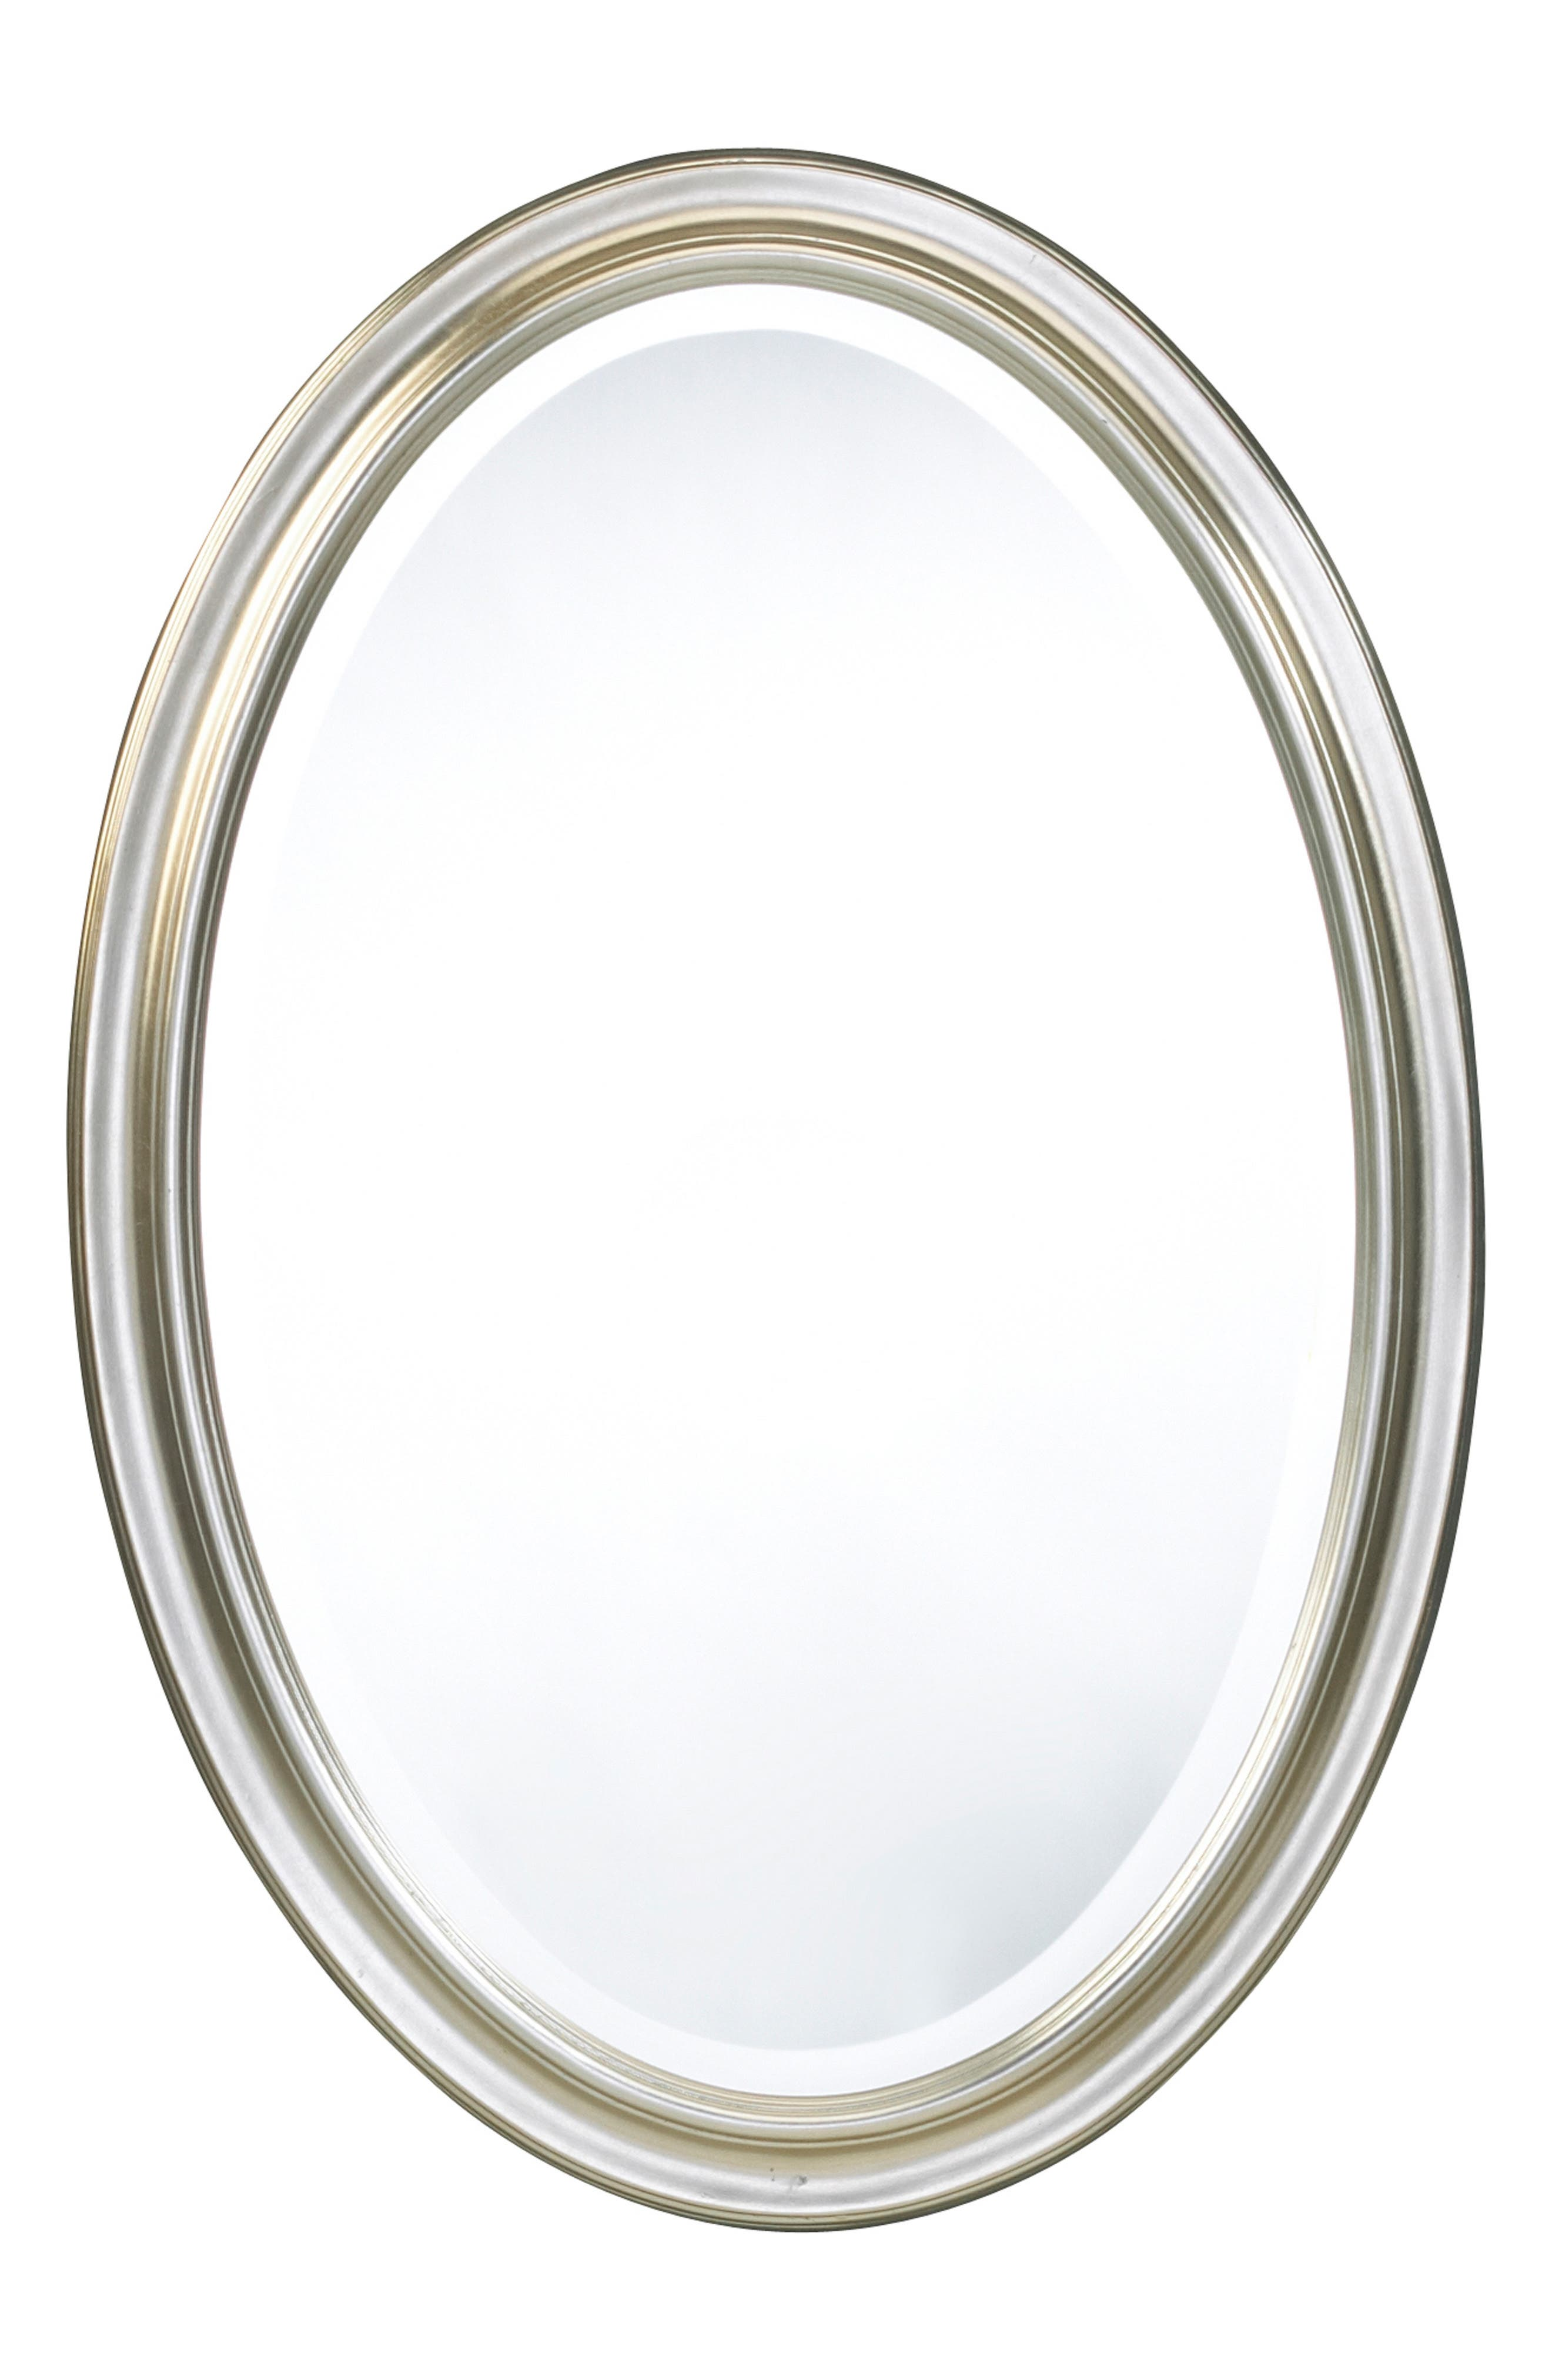 Silver Oval Wall Mirror,                             Main thumbnail 1, color,                             METALLIC SILVER